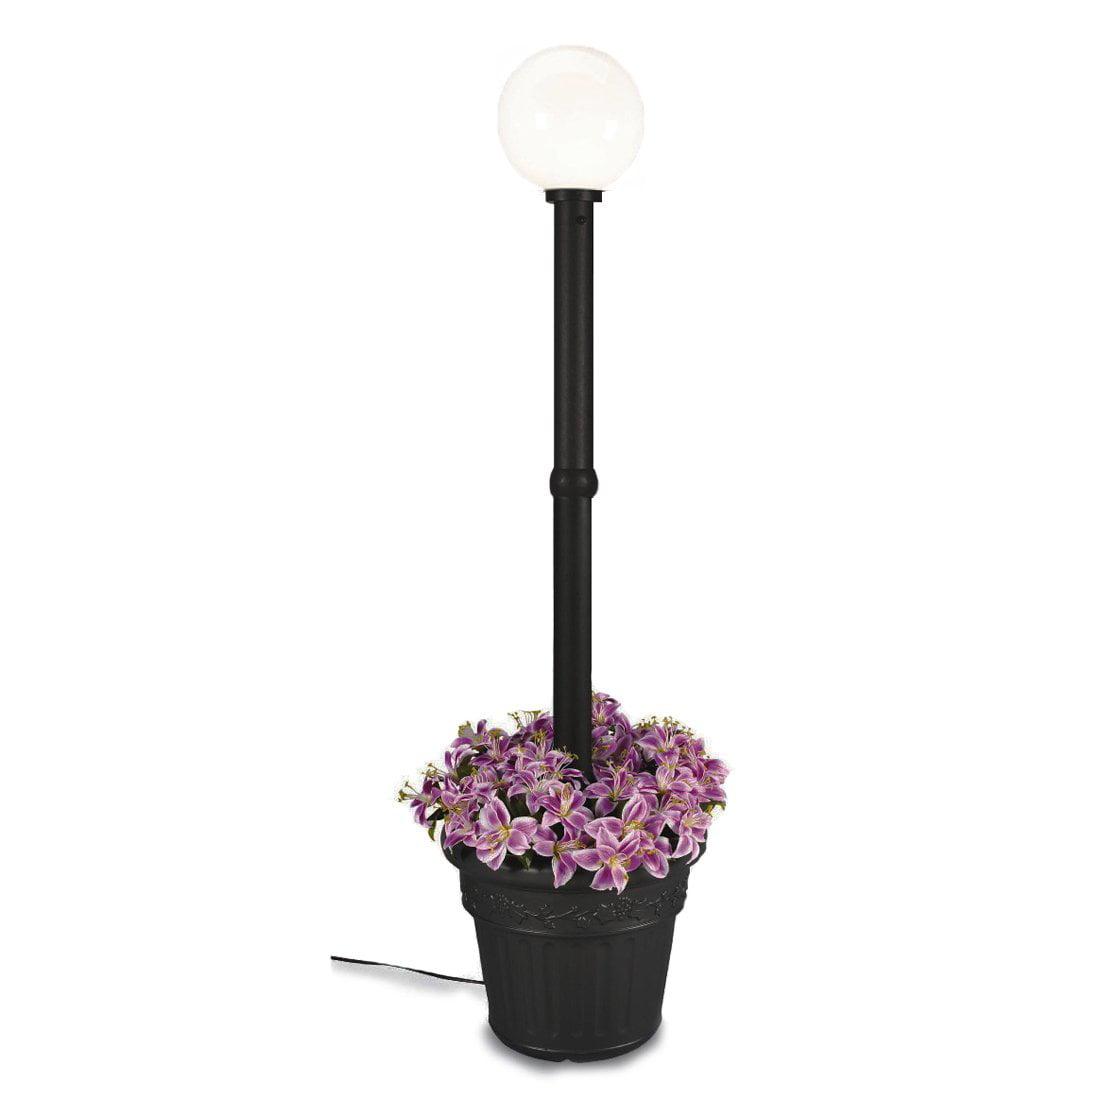 Patio Living Concepts Milano 82 Inch Black w  White Globe Lantern Planter by Patio Living Concepts